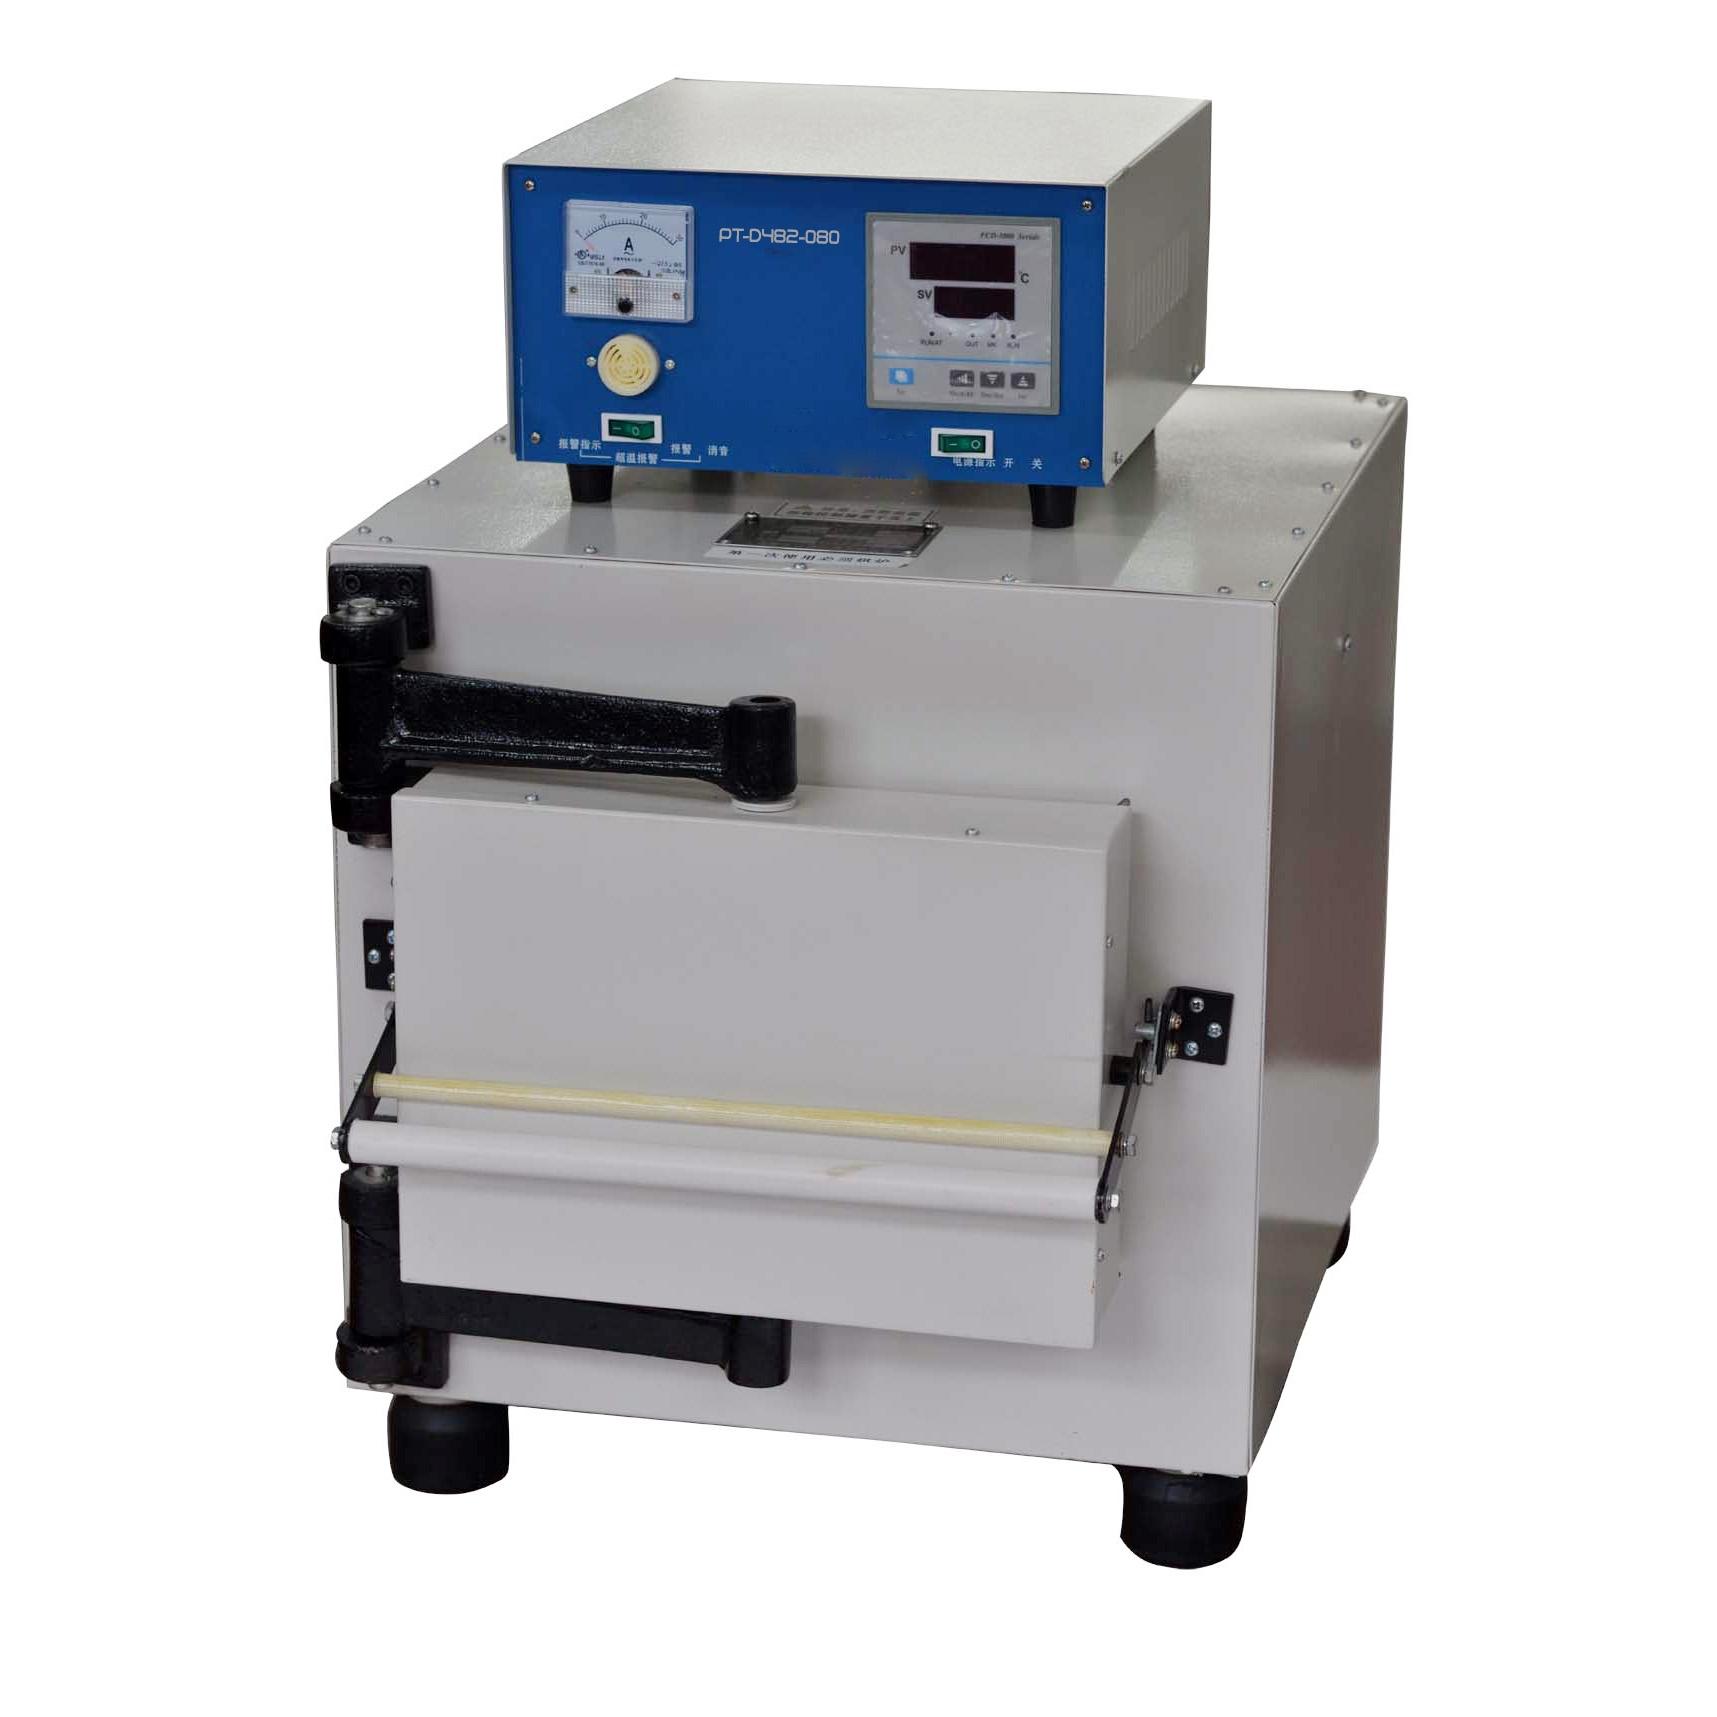 The Ash Content of Petroleum Products Determination Apparatus